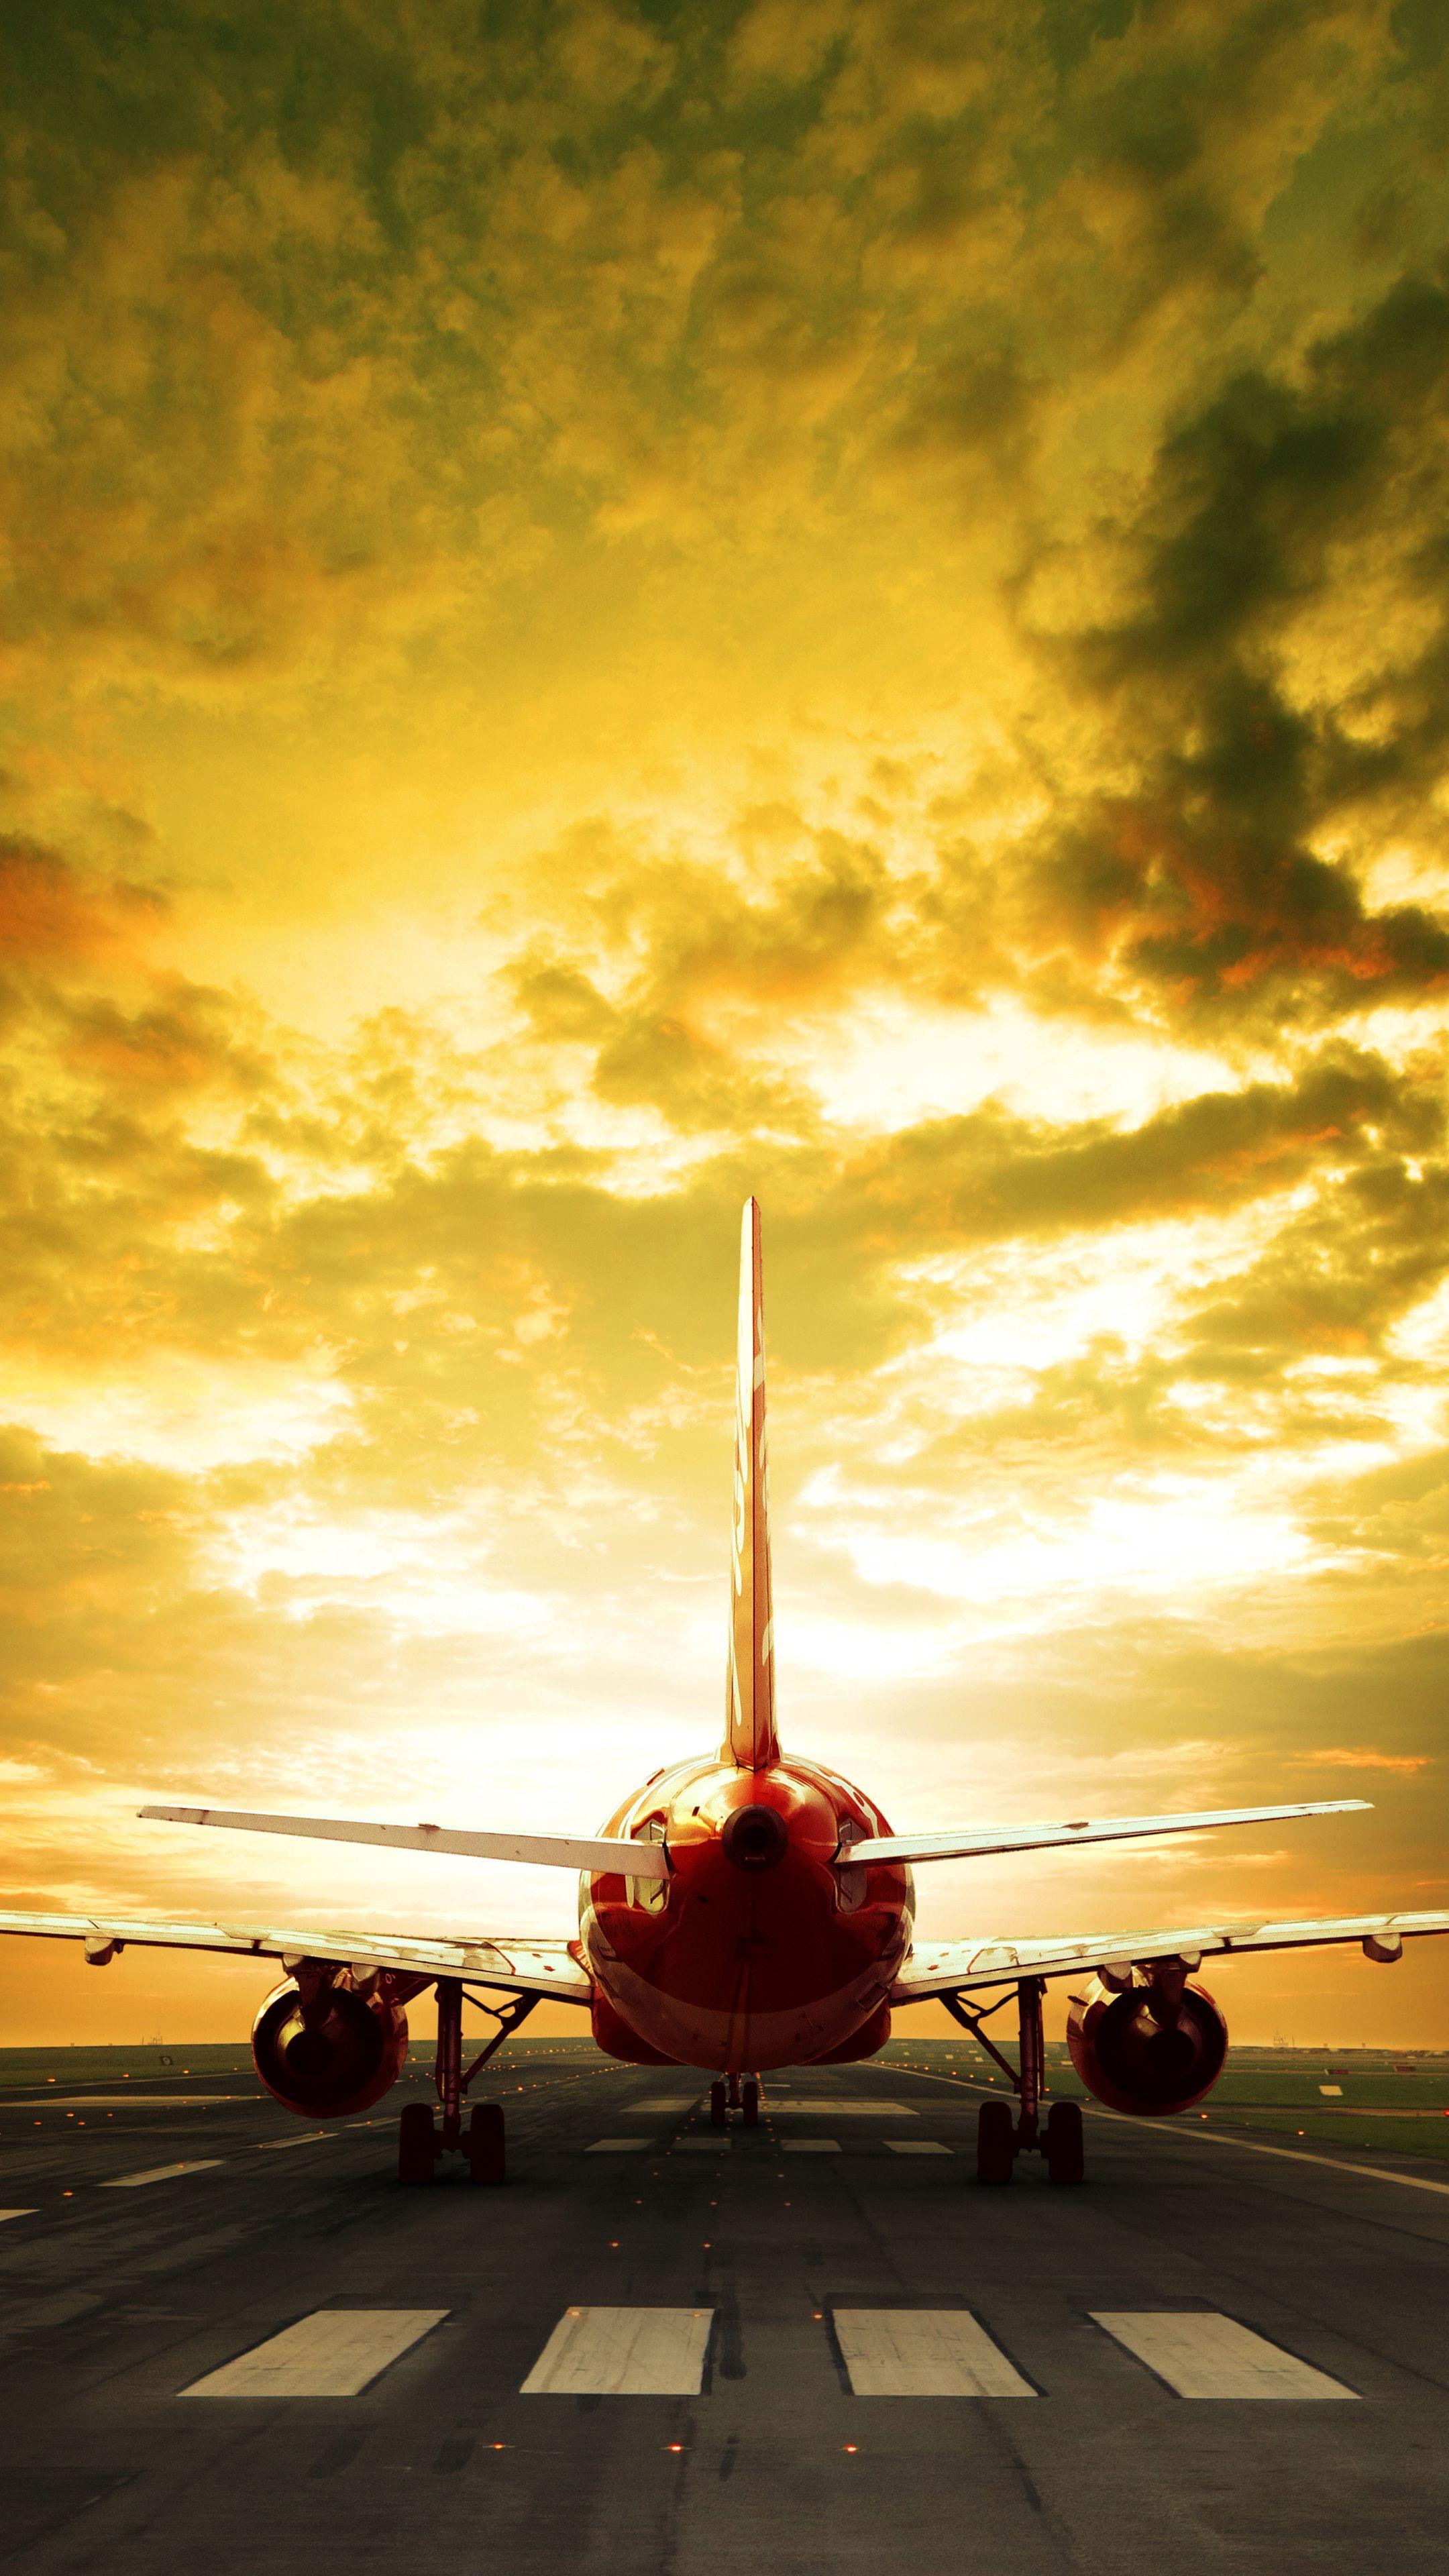 Misc Passenger Airplane 4k wallpapers Fotos